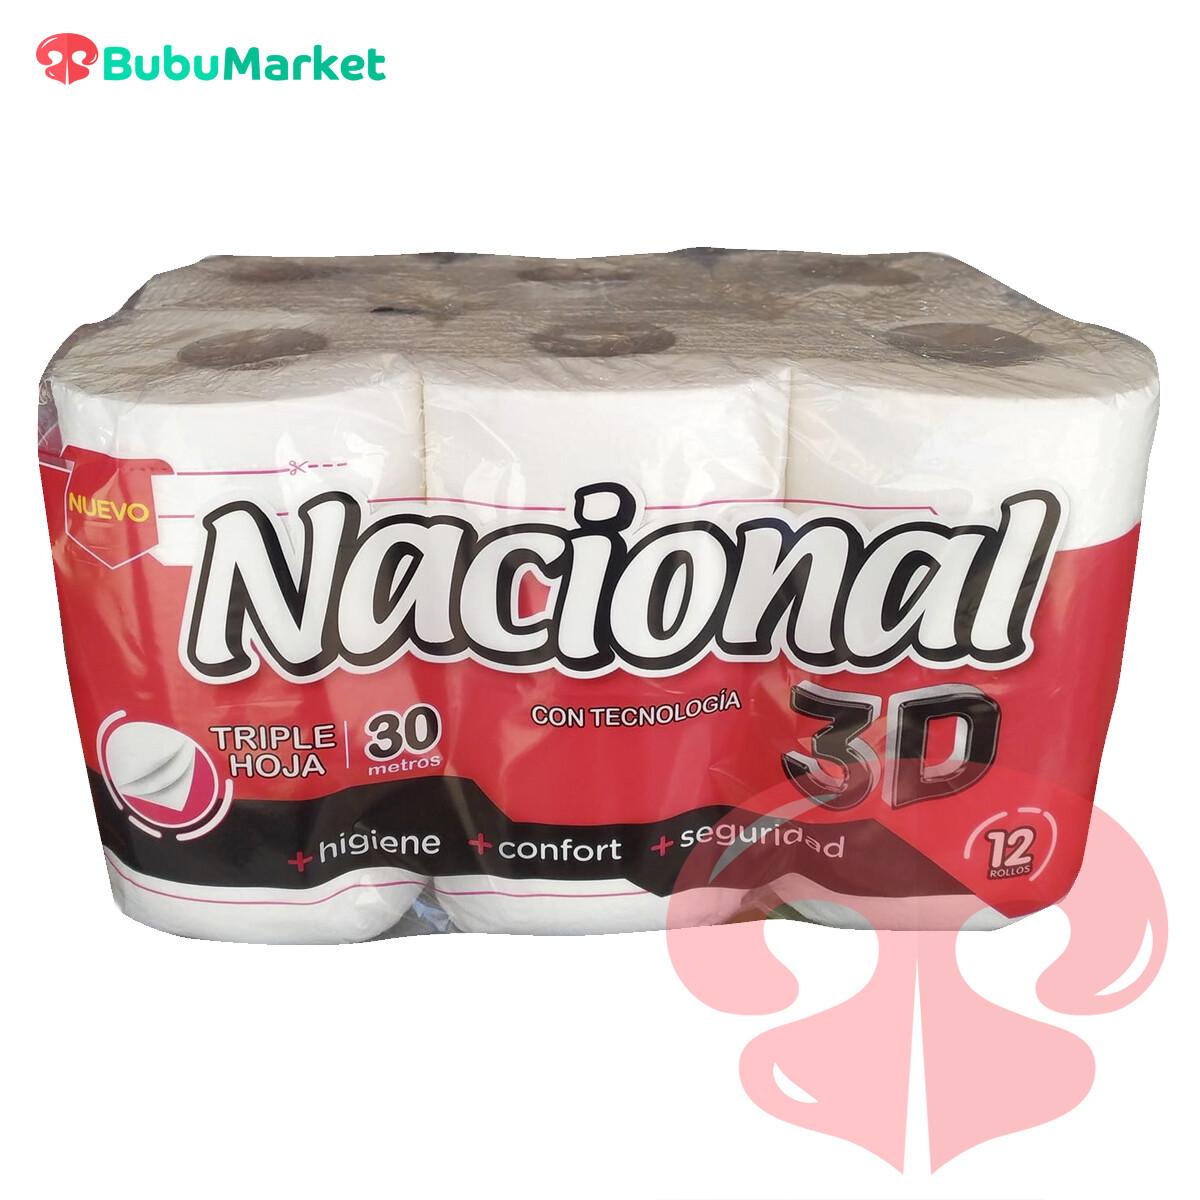 PAPEL HIGIENICO NACIONAL TRIPLE HOJA 3D 12 ROLLOS